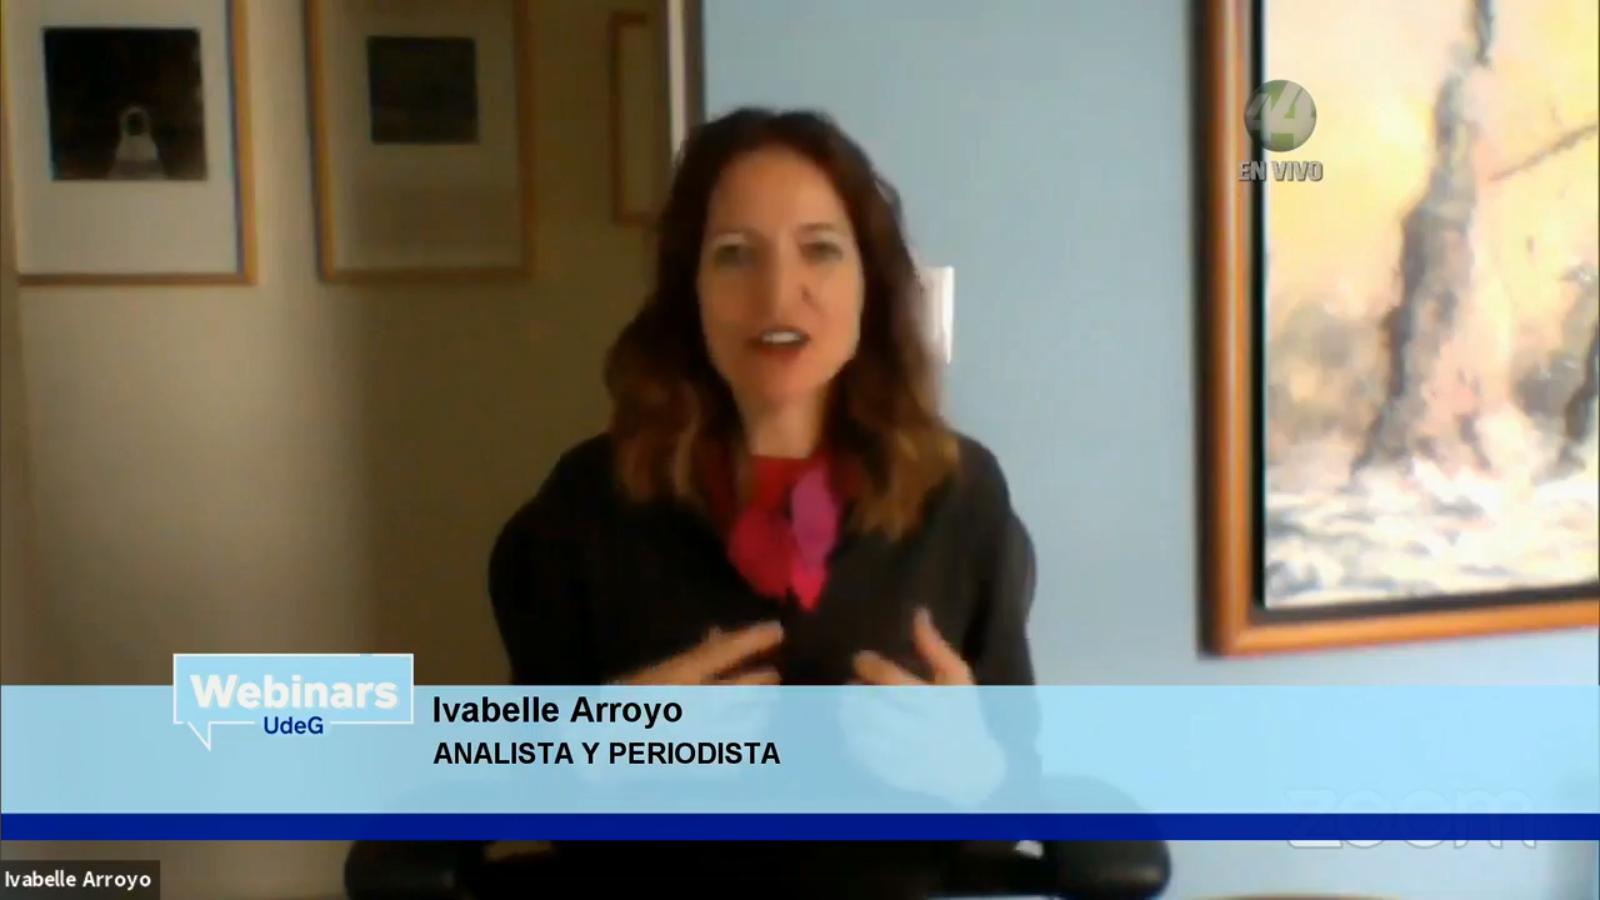 La periodista Ivabelle Arroyo